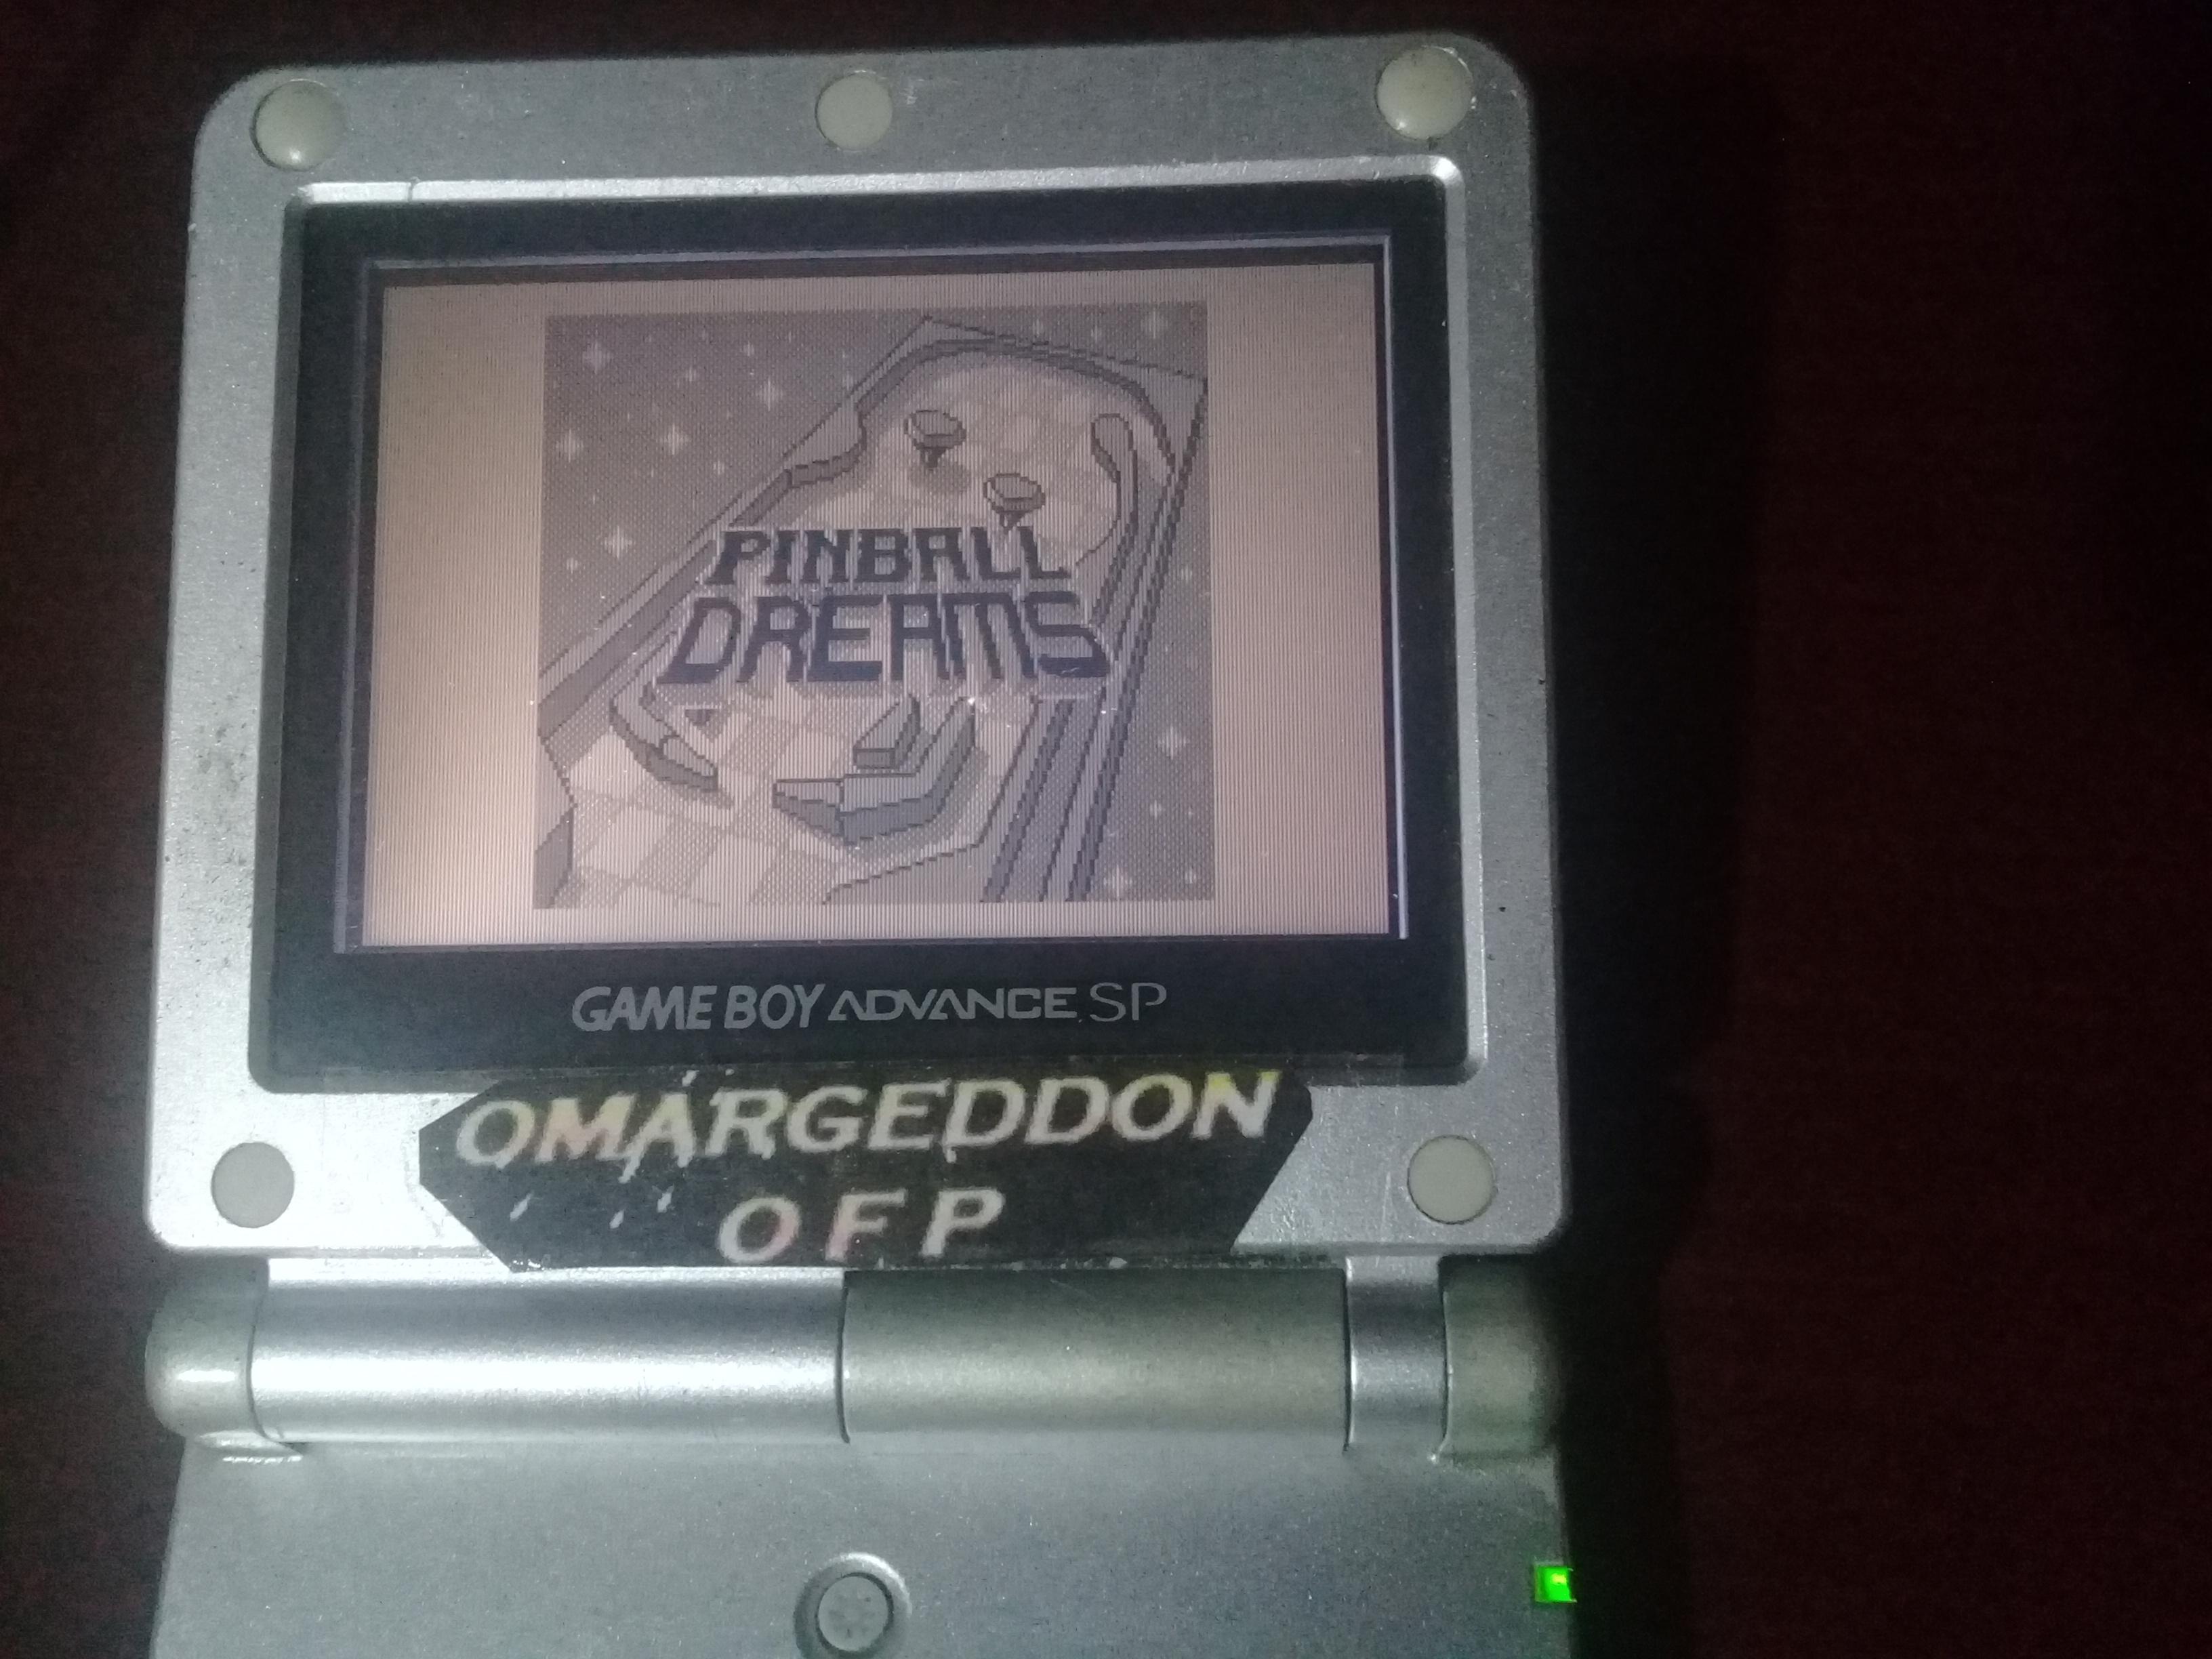 omargeddon: Pinball Dreams: Graveyard (Game Boy) 16,366,711 points on 2019-01-12 14:12:25